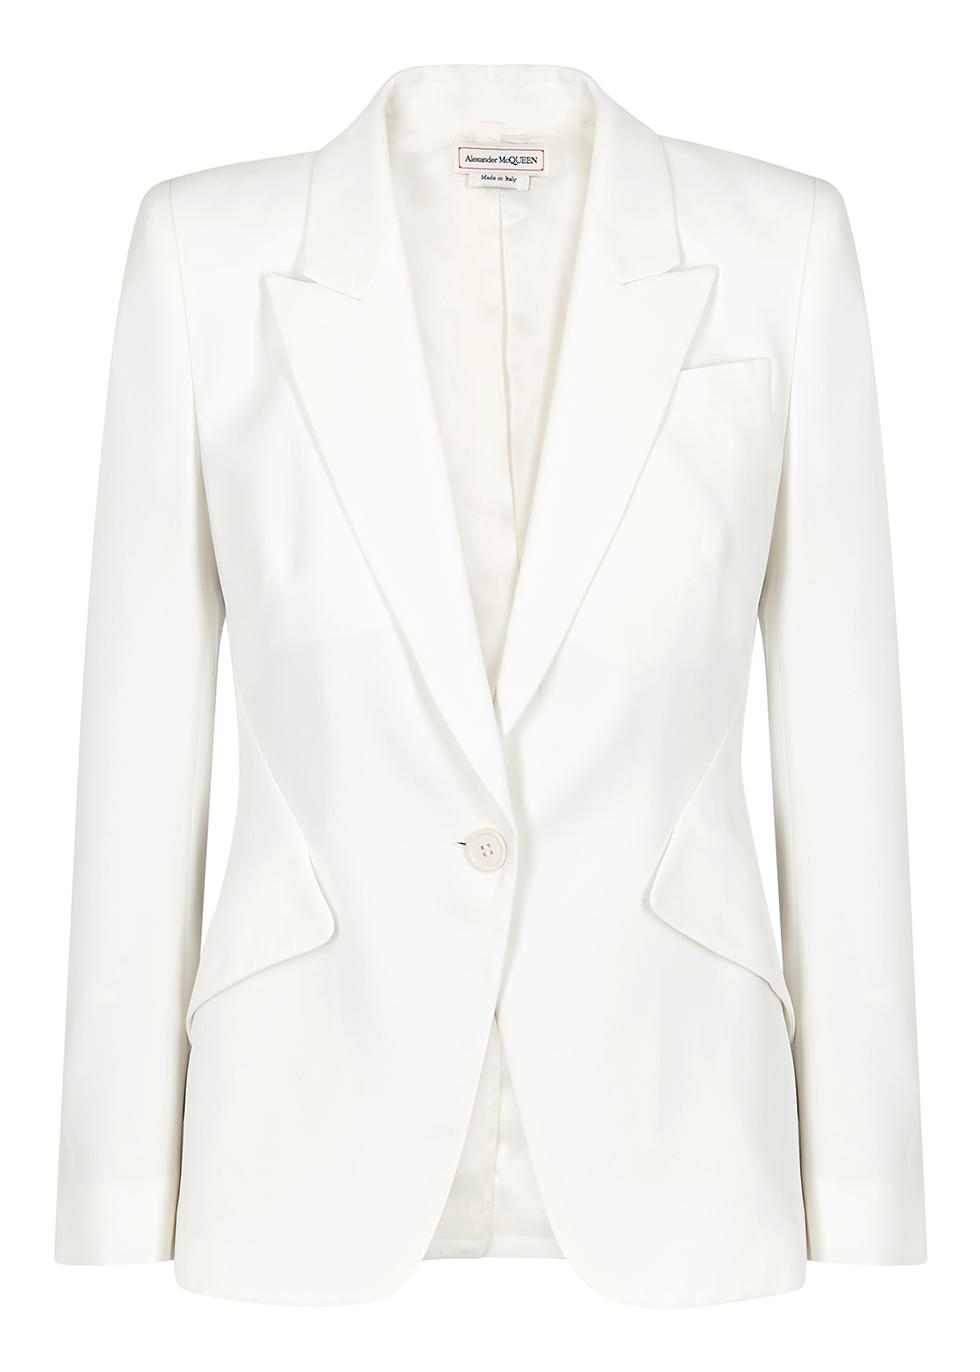 07195795d1 Women's Designer Jackets - Harvey Nichols